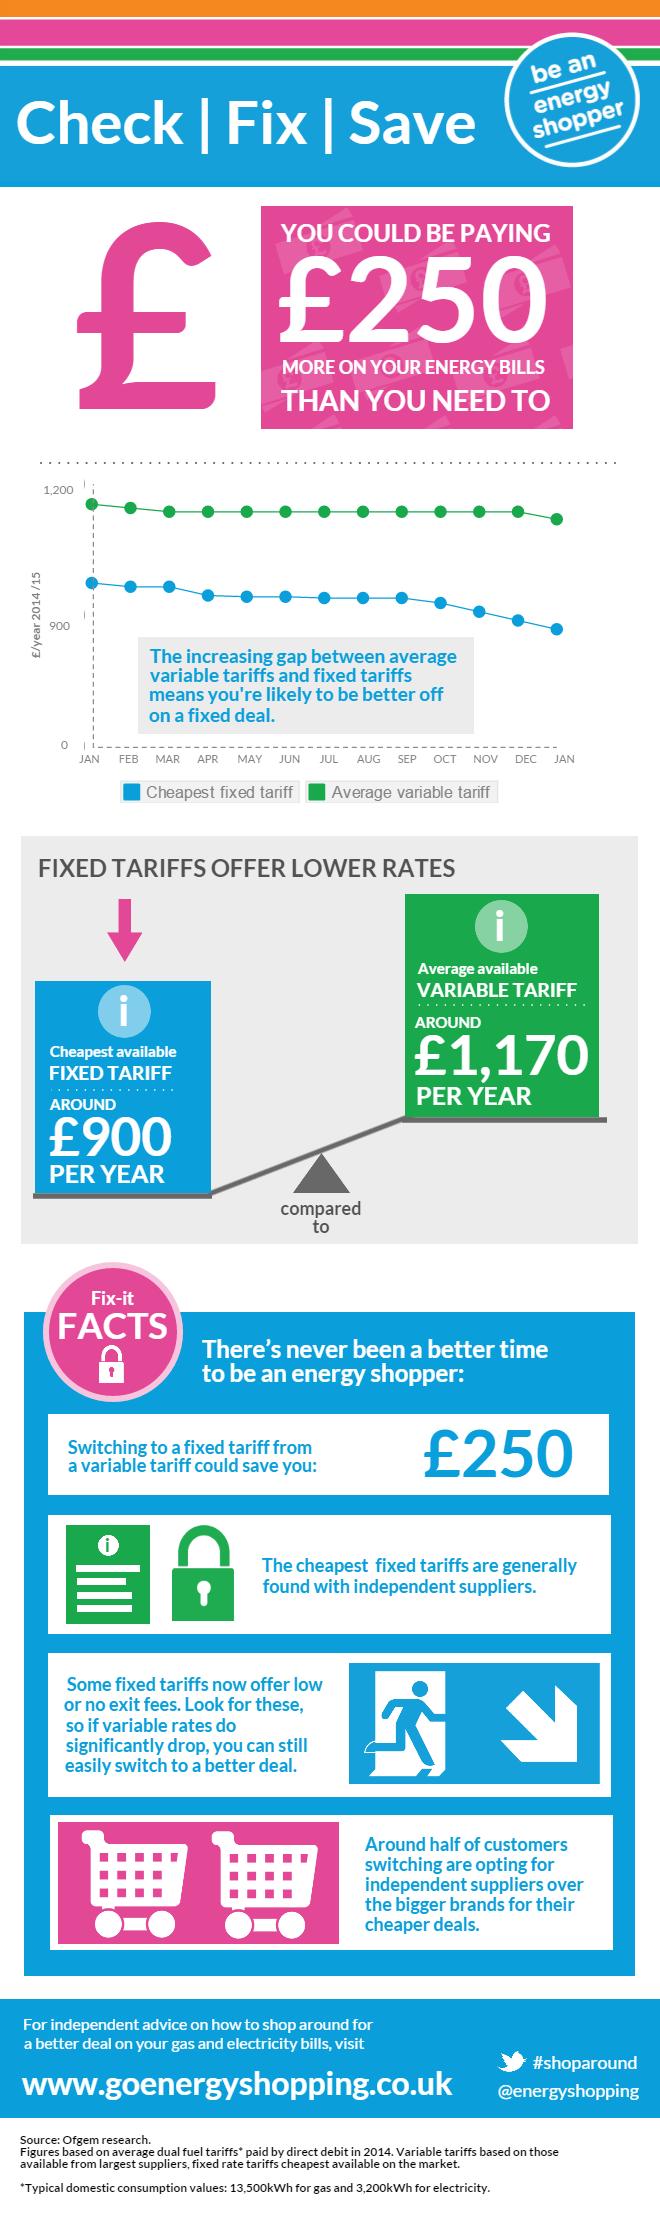 Full fix now infographic